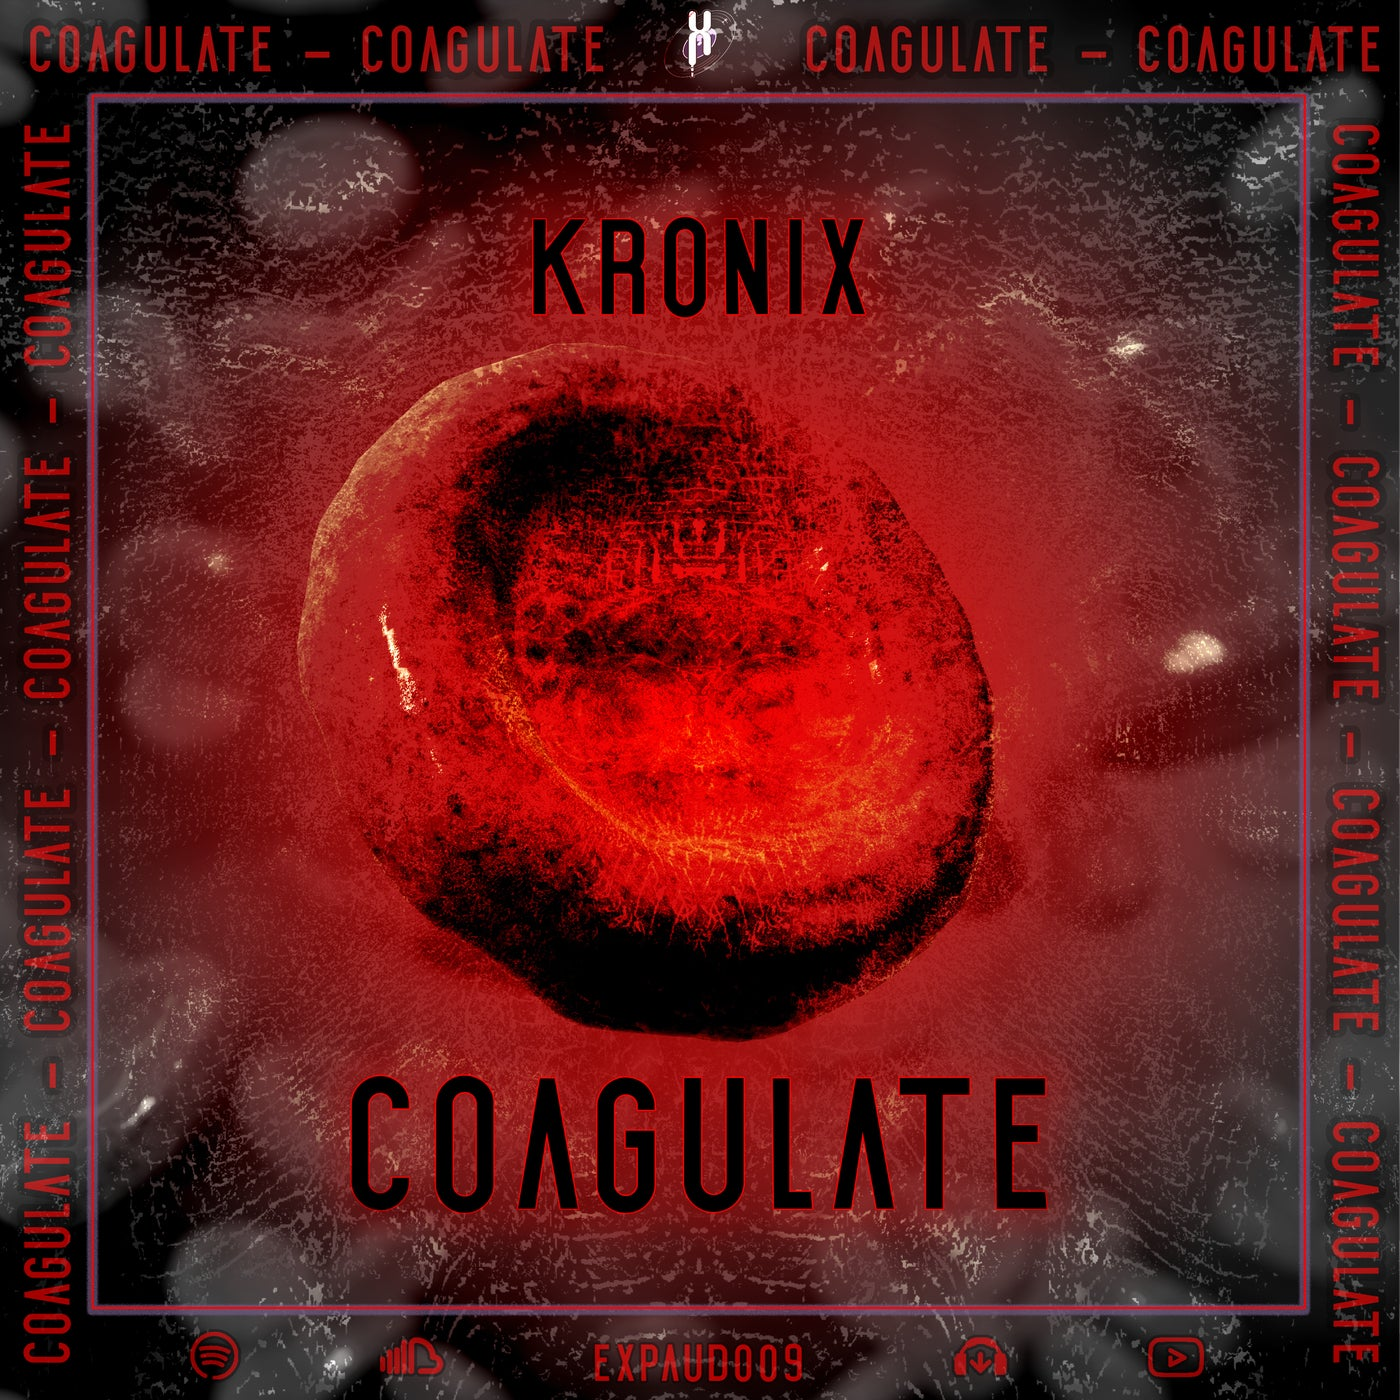 Coagulate (Original Mix)